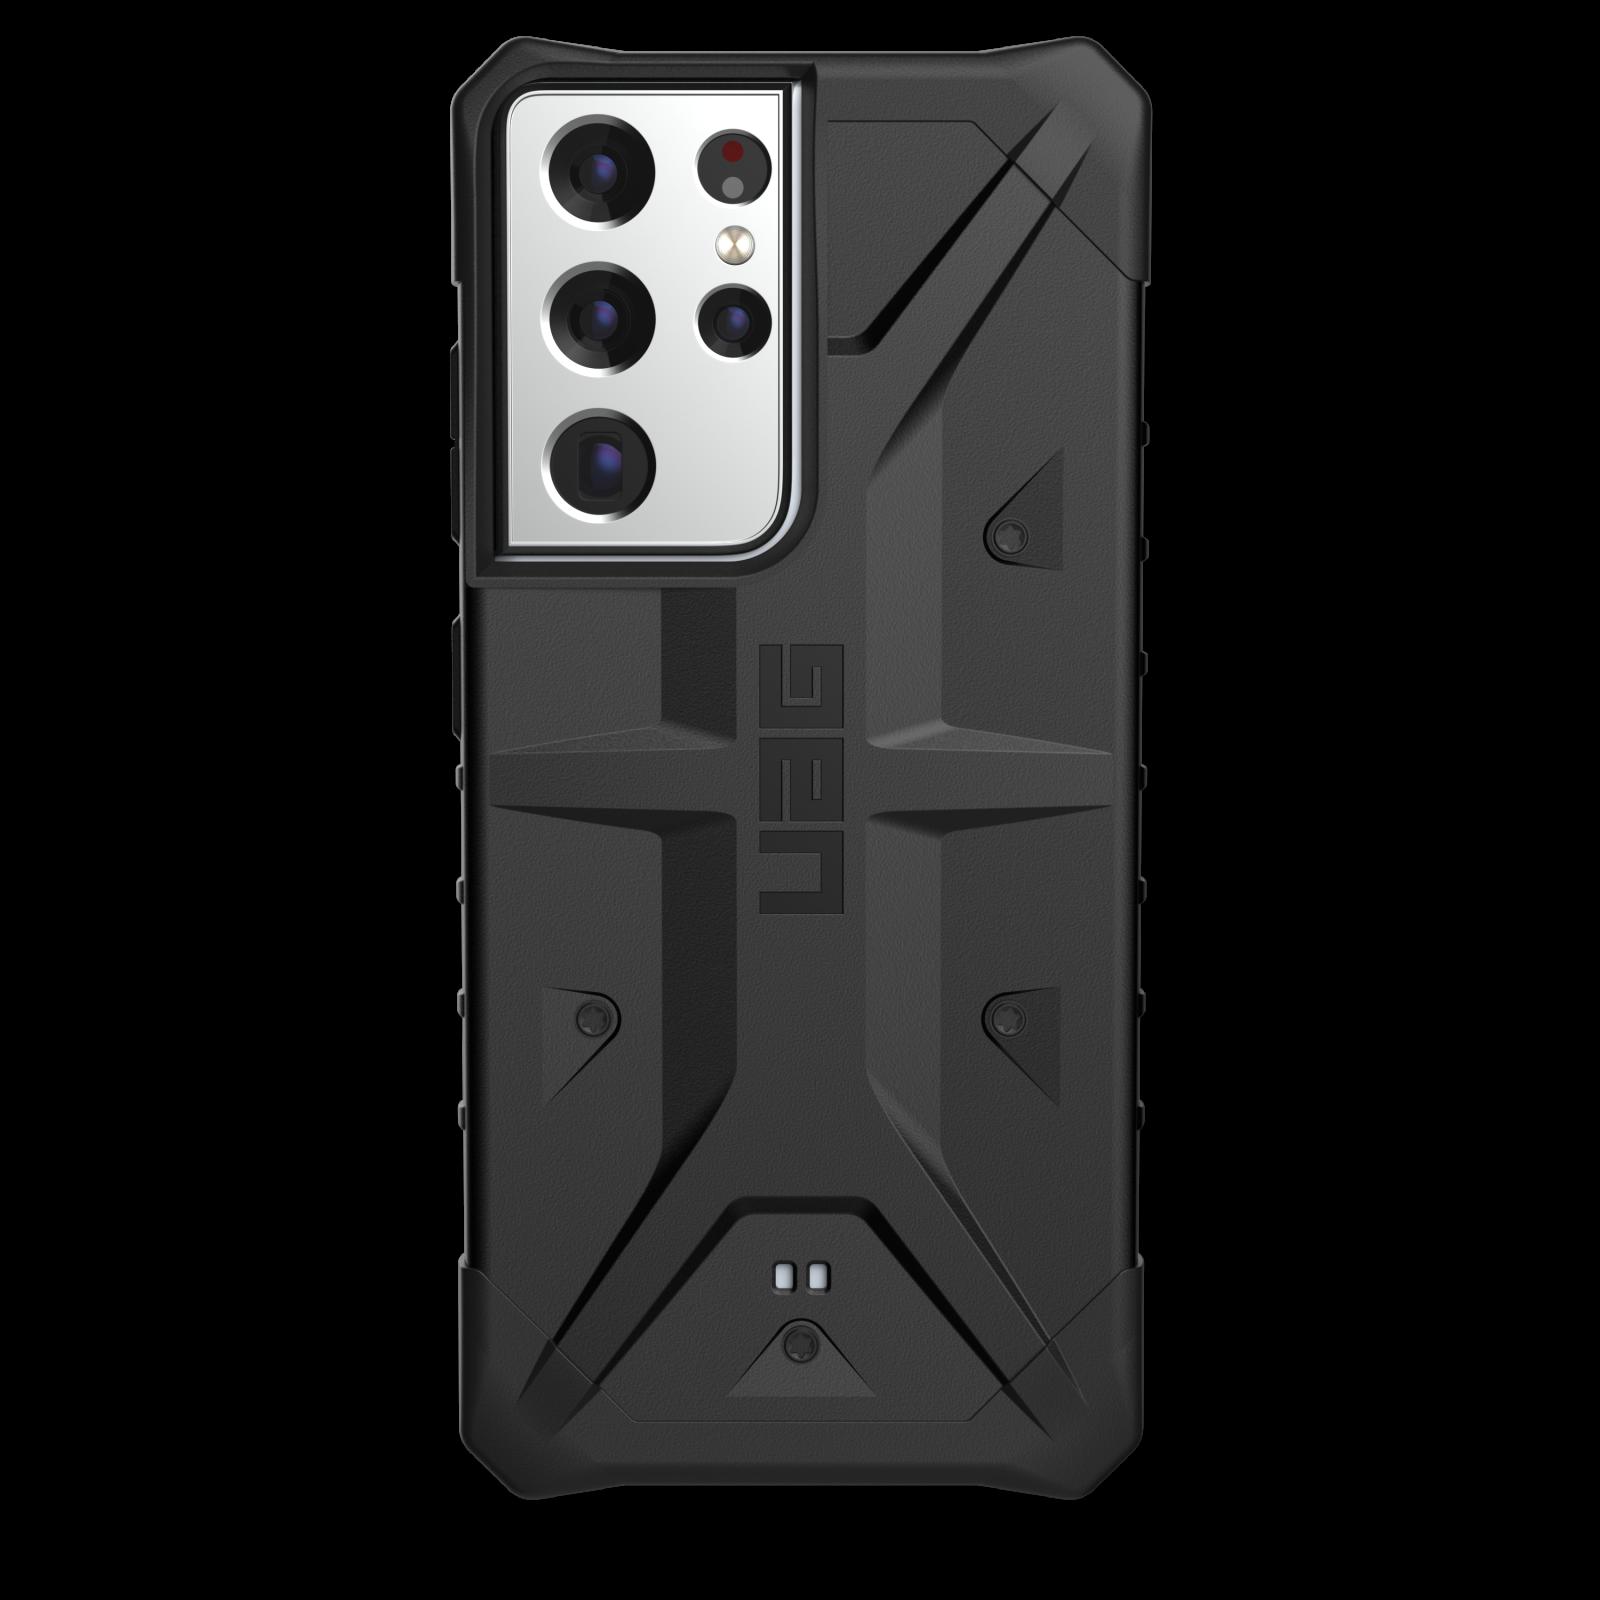 Pathfinder Series Case Galaxy S21 Ultra Black